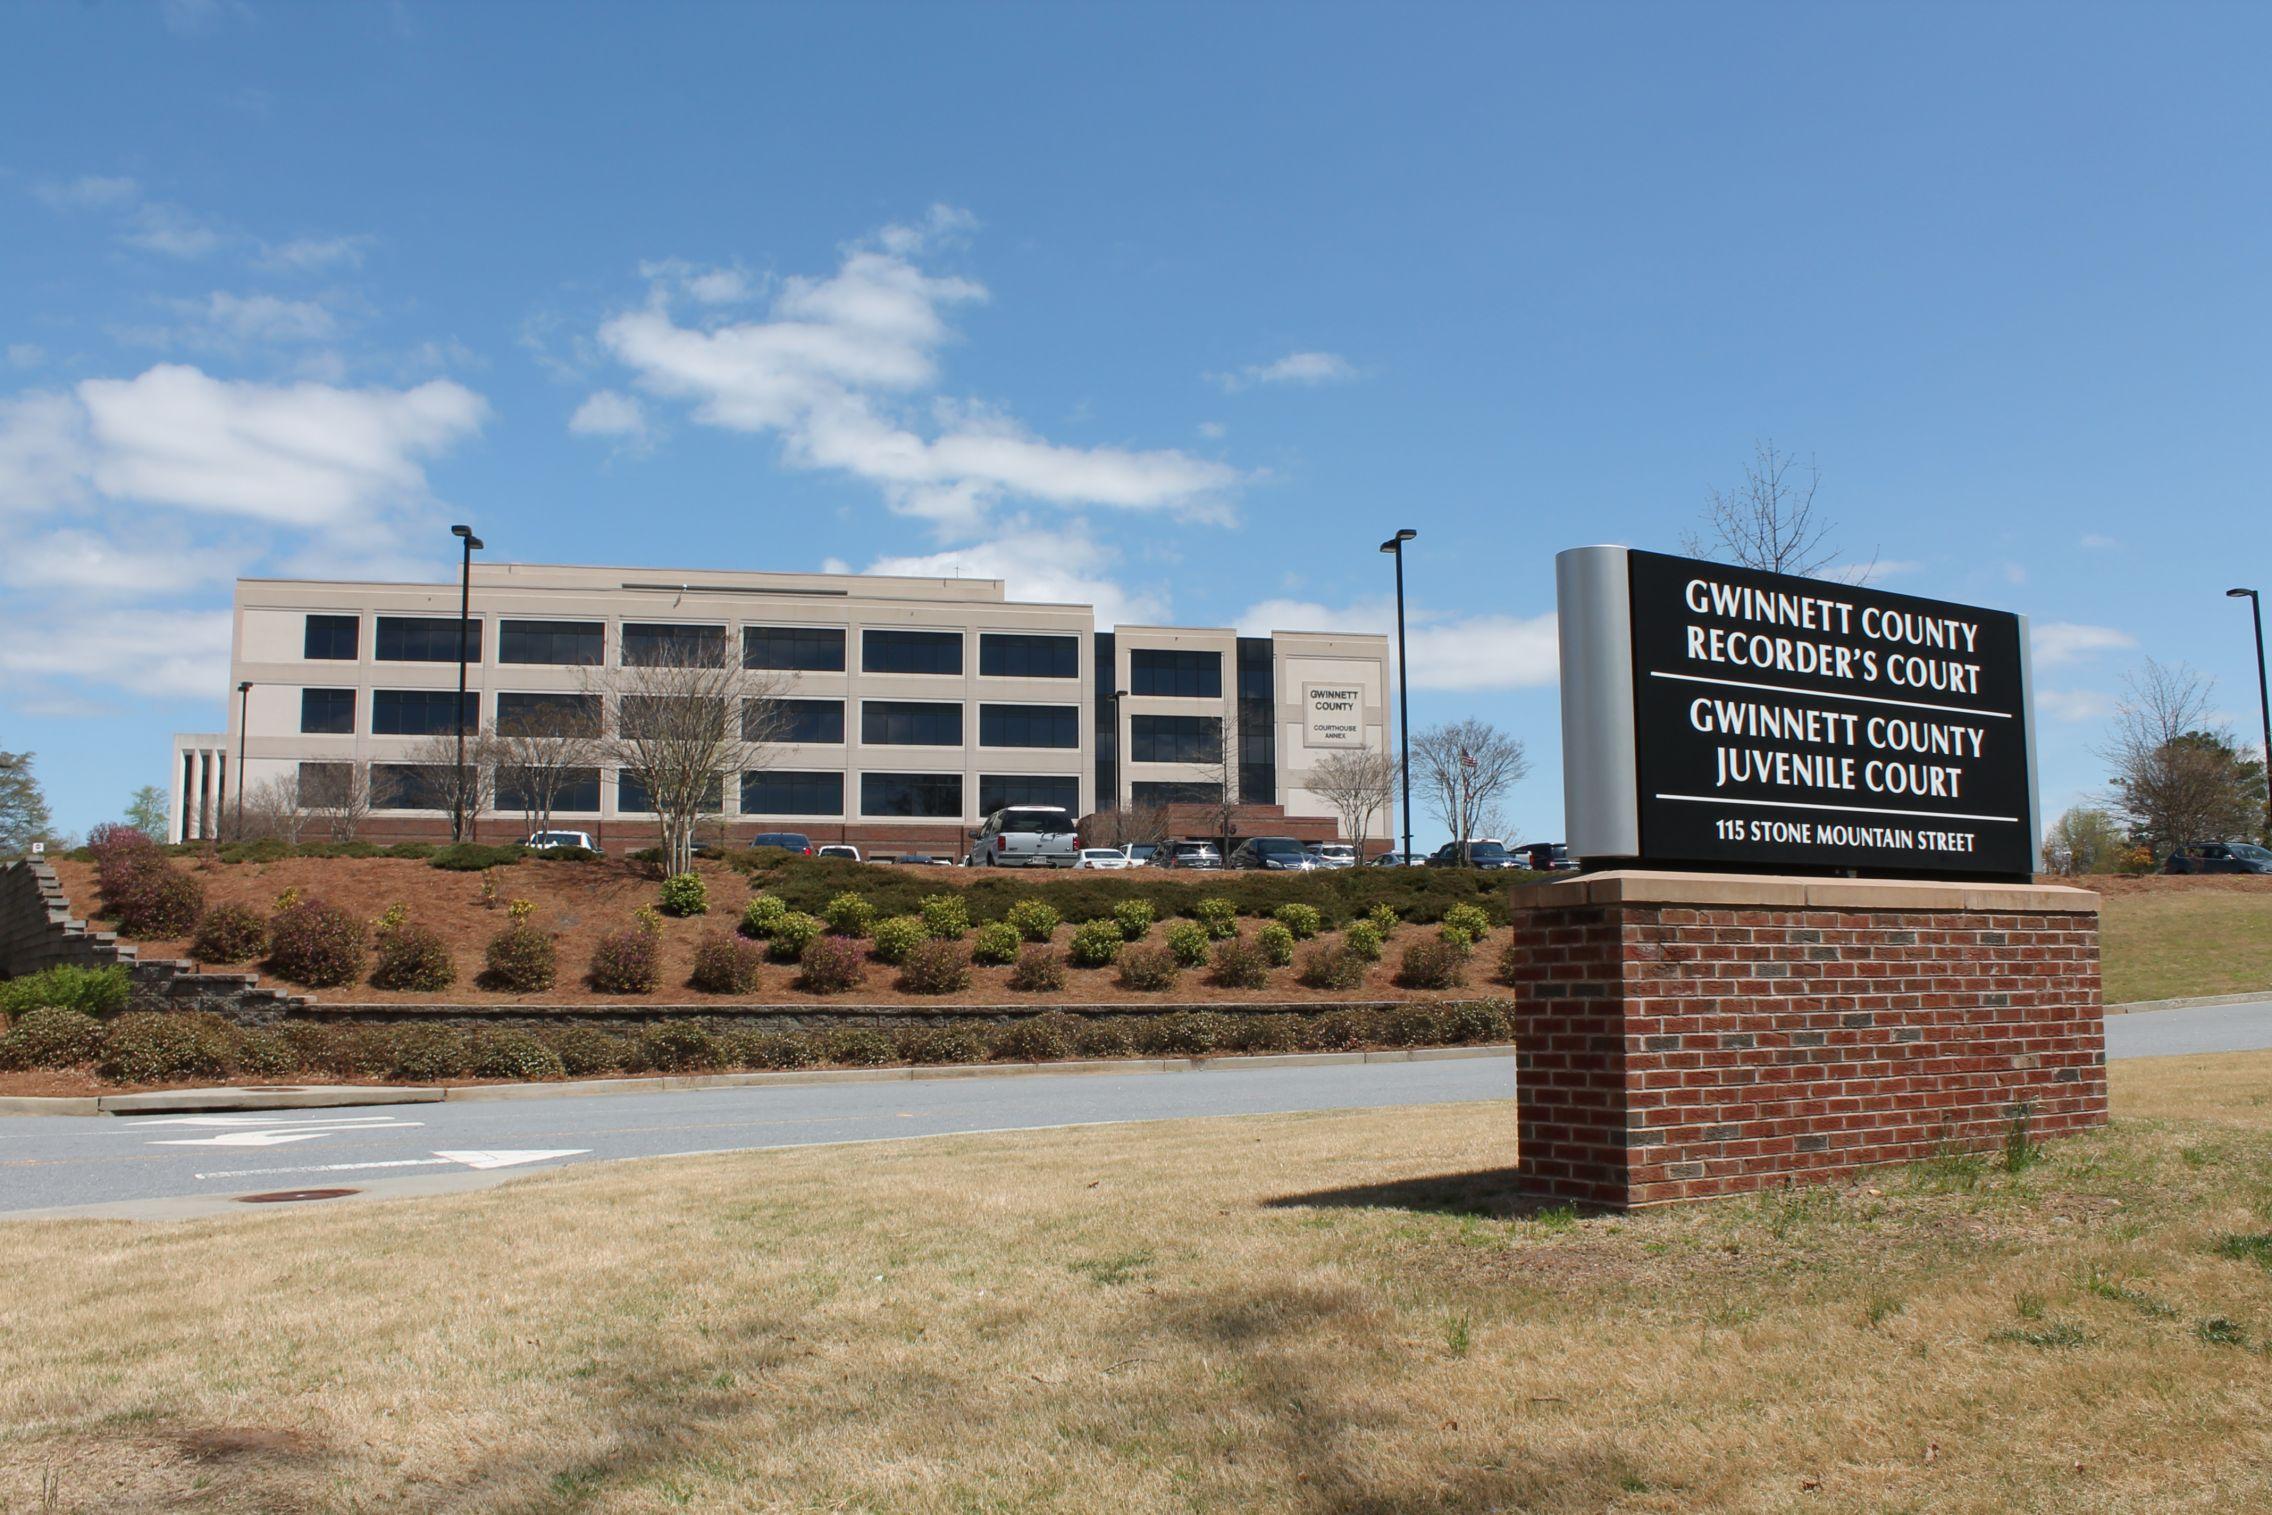 Gwinnett County DUI Lawyers - Chestney & Sullivan DUI Defense Firm